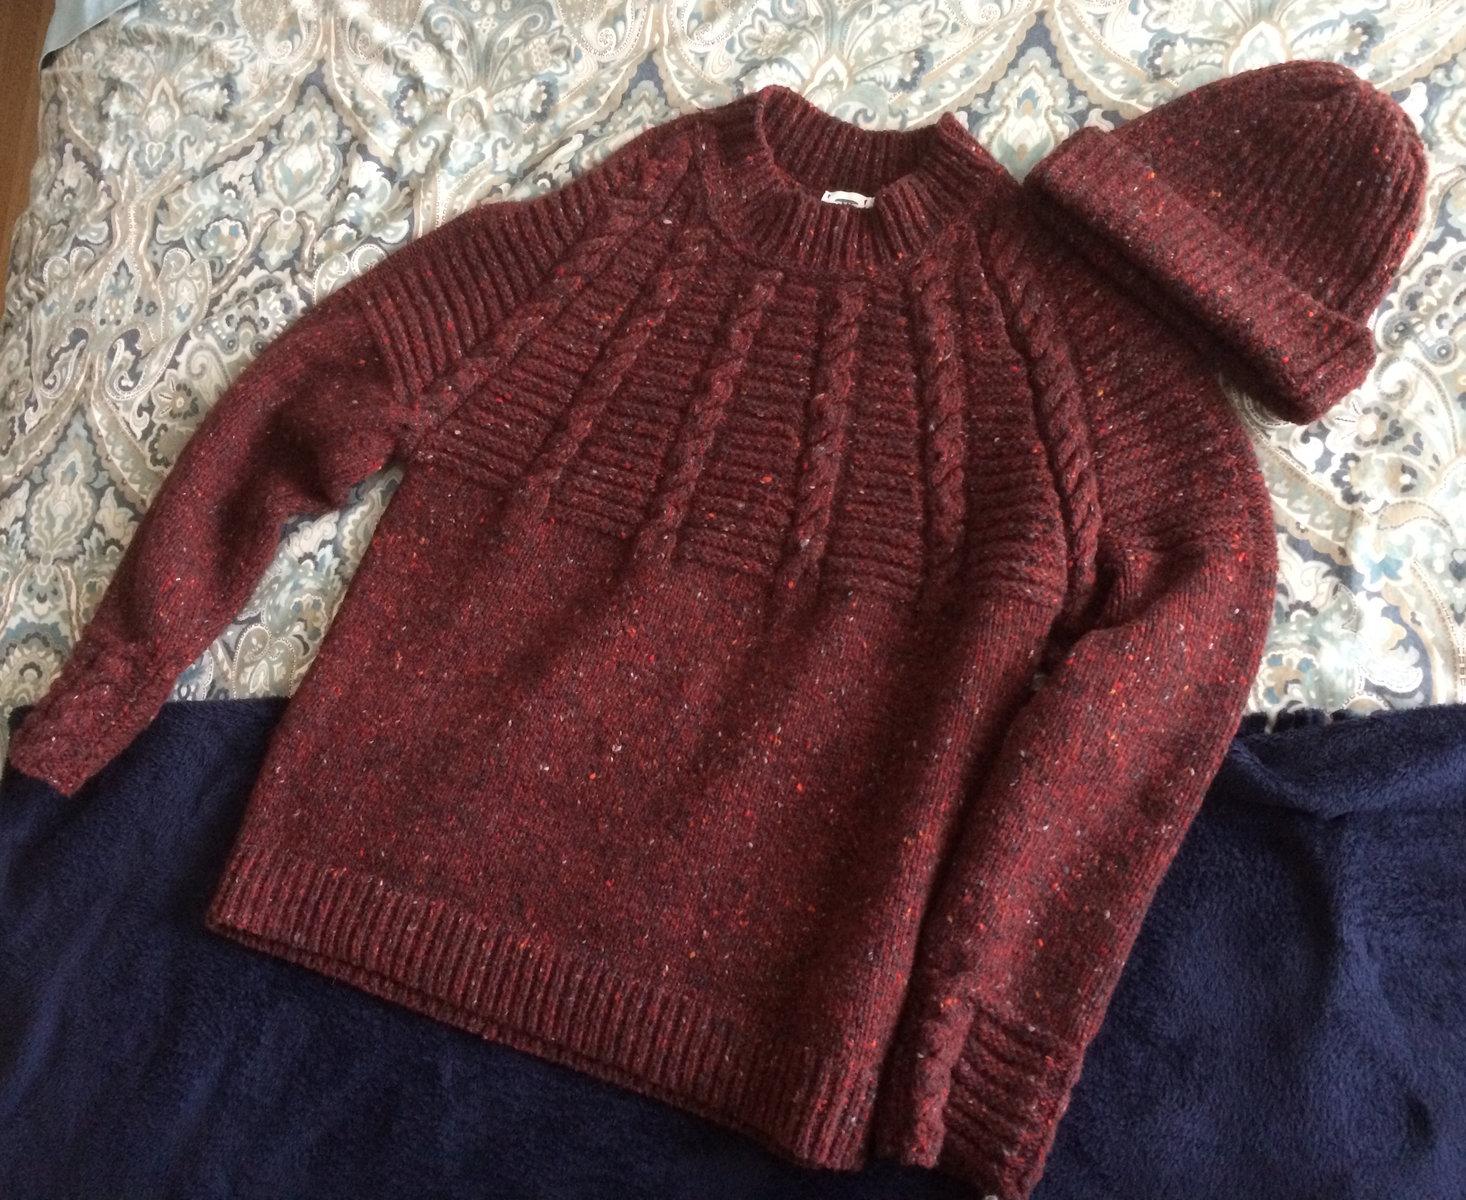 Inis Meáin-18E Red Sweater & Beanie.jpg